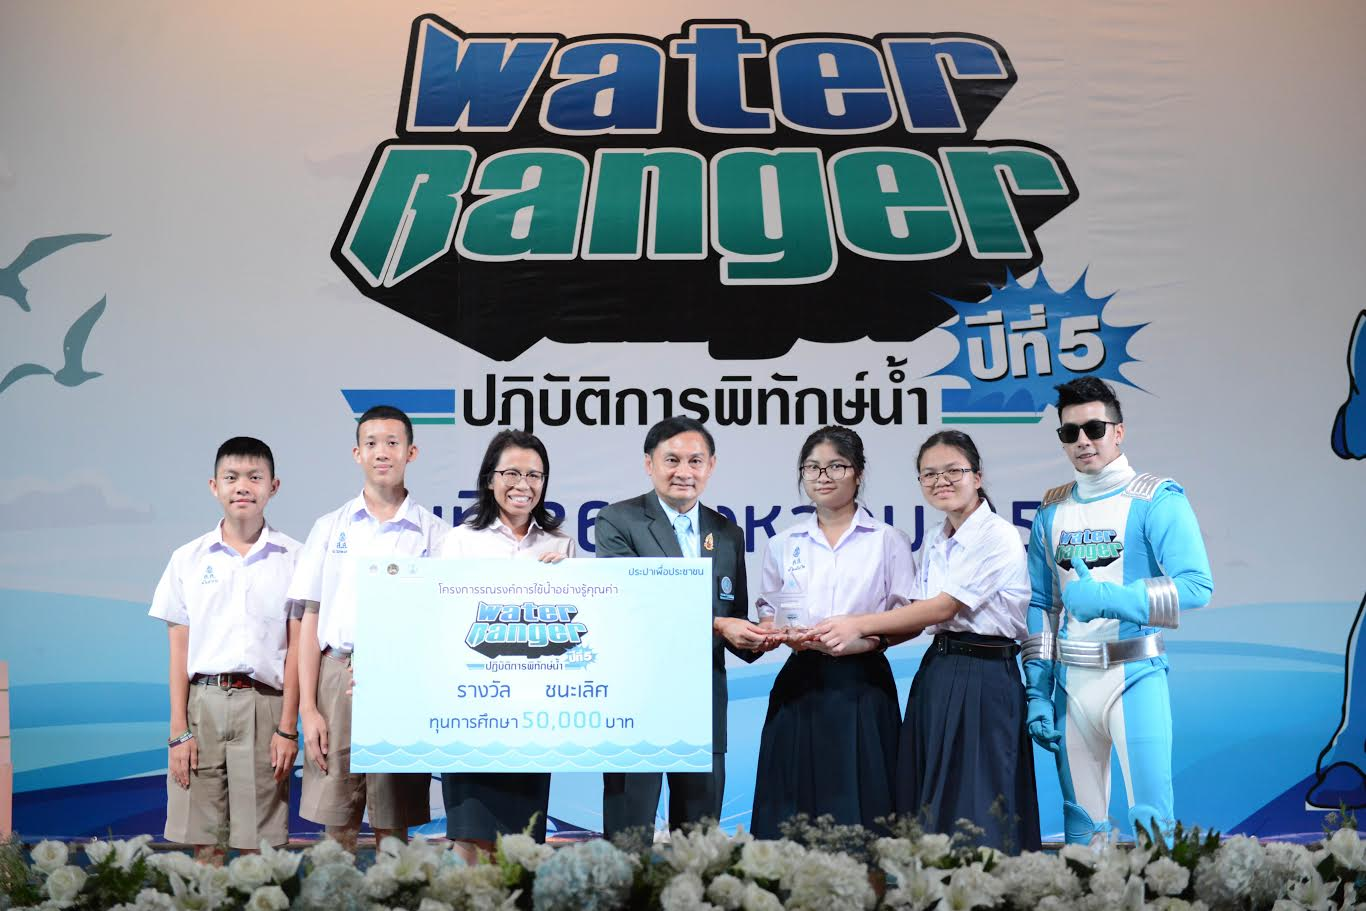 Water Ranger ปฎิบัติการพิทักษ์น้ำ ปีที่5